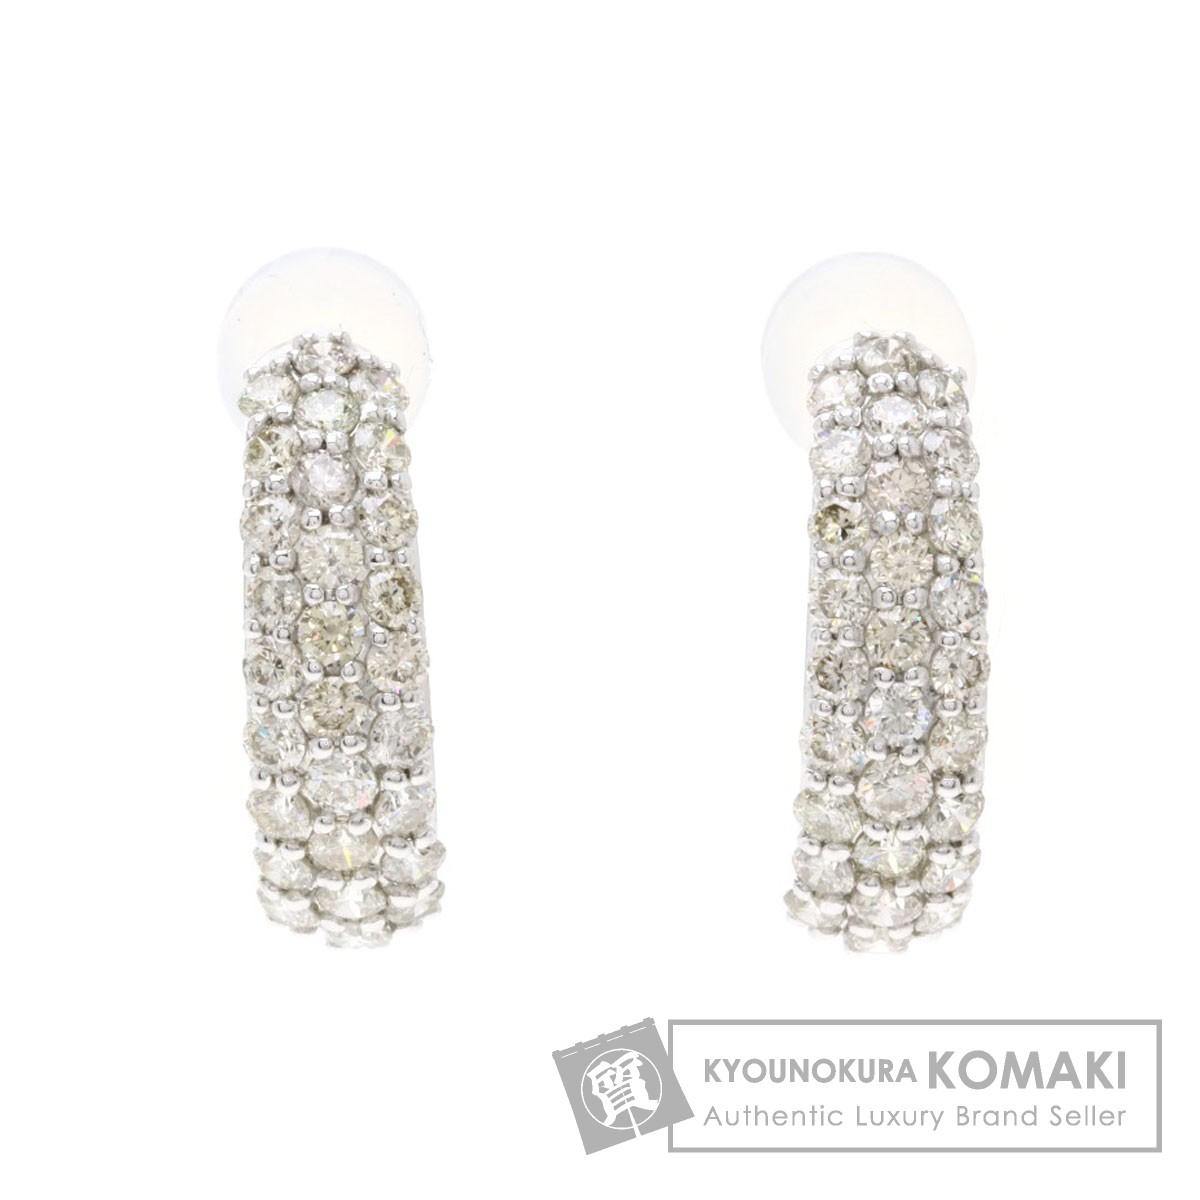 0.5ct ダイヤモンド ピアス K18ホワイトゴールド 1.5g レディース 【中古】